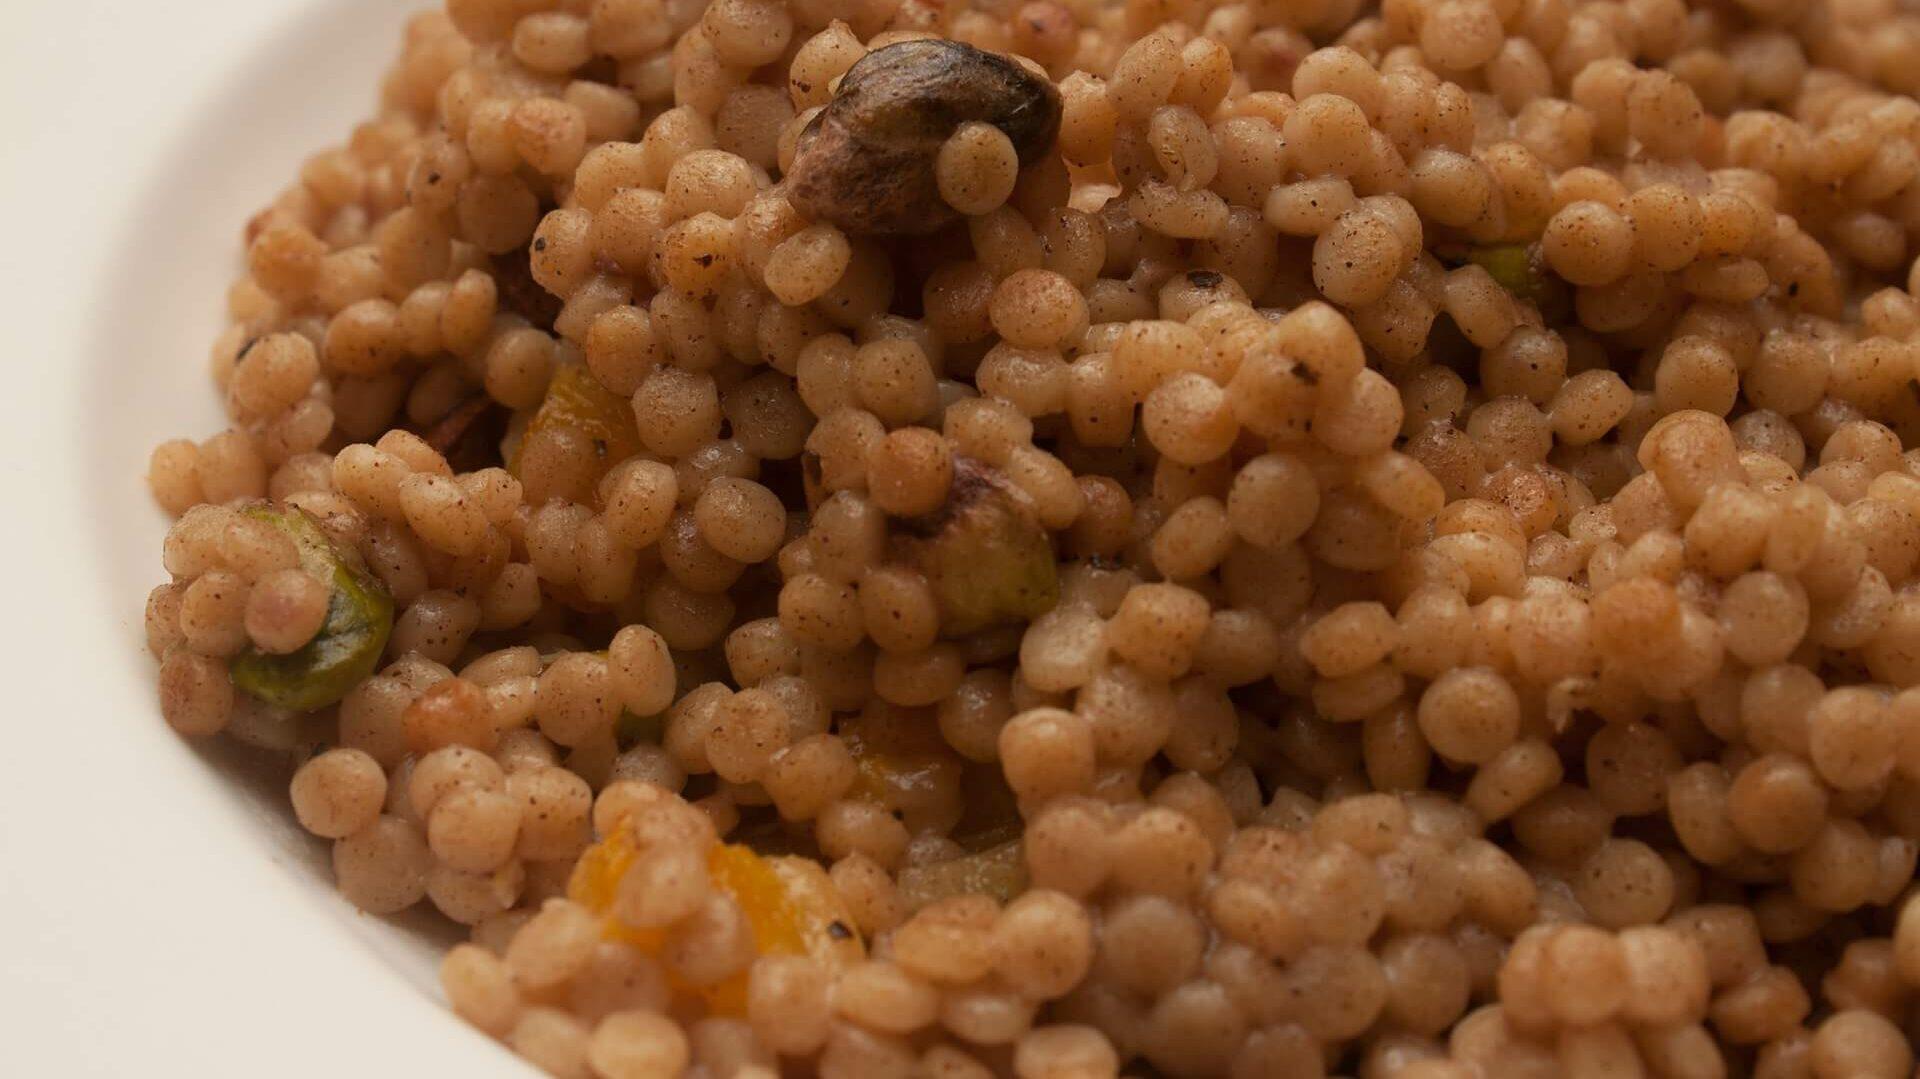 israeli couscous in a bowl